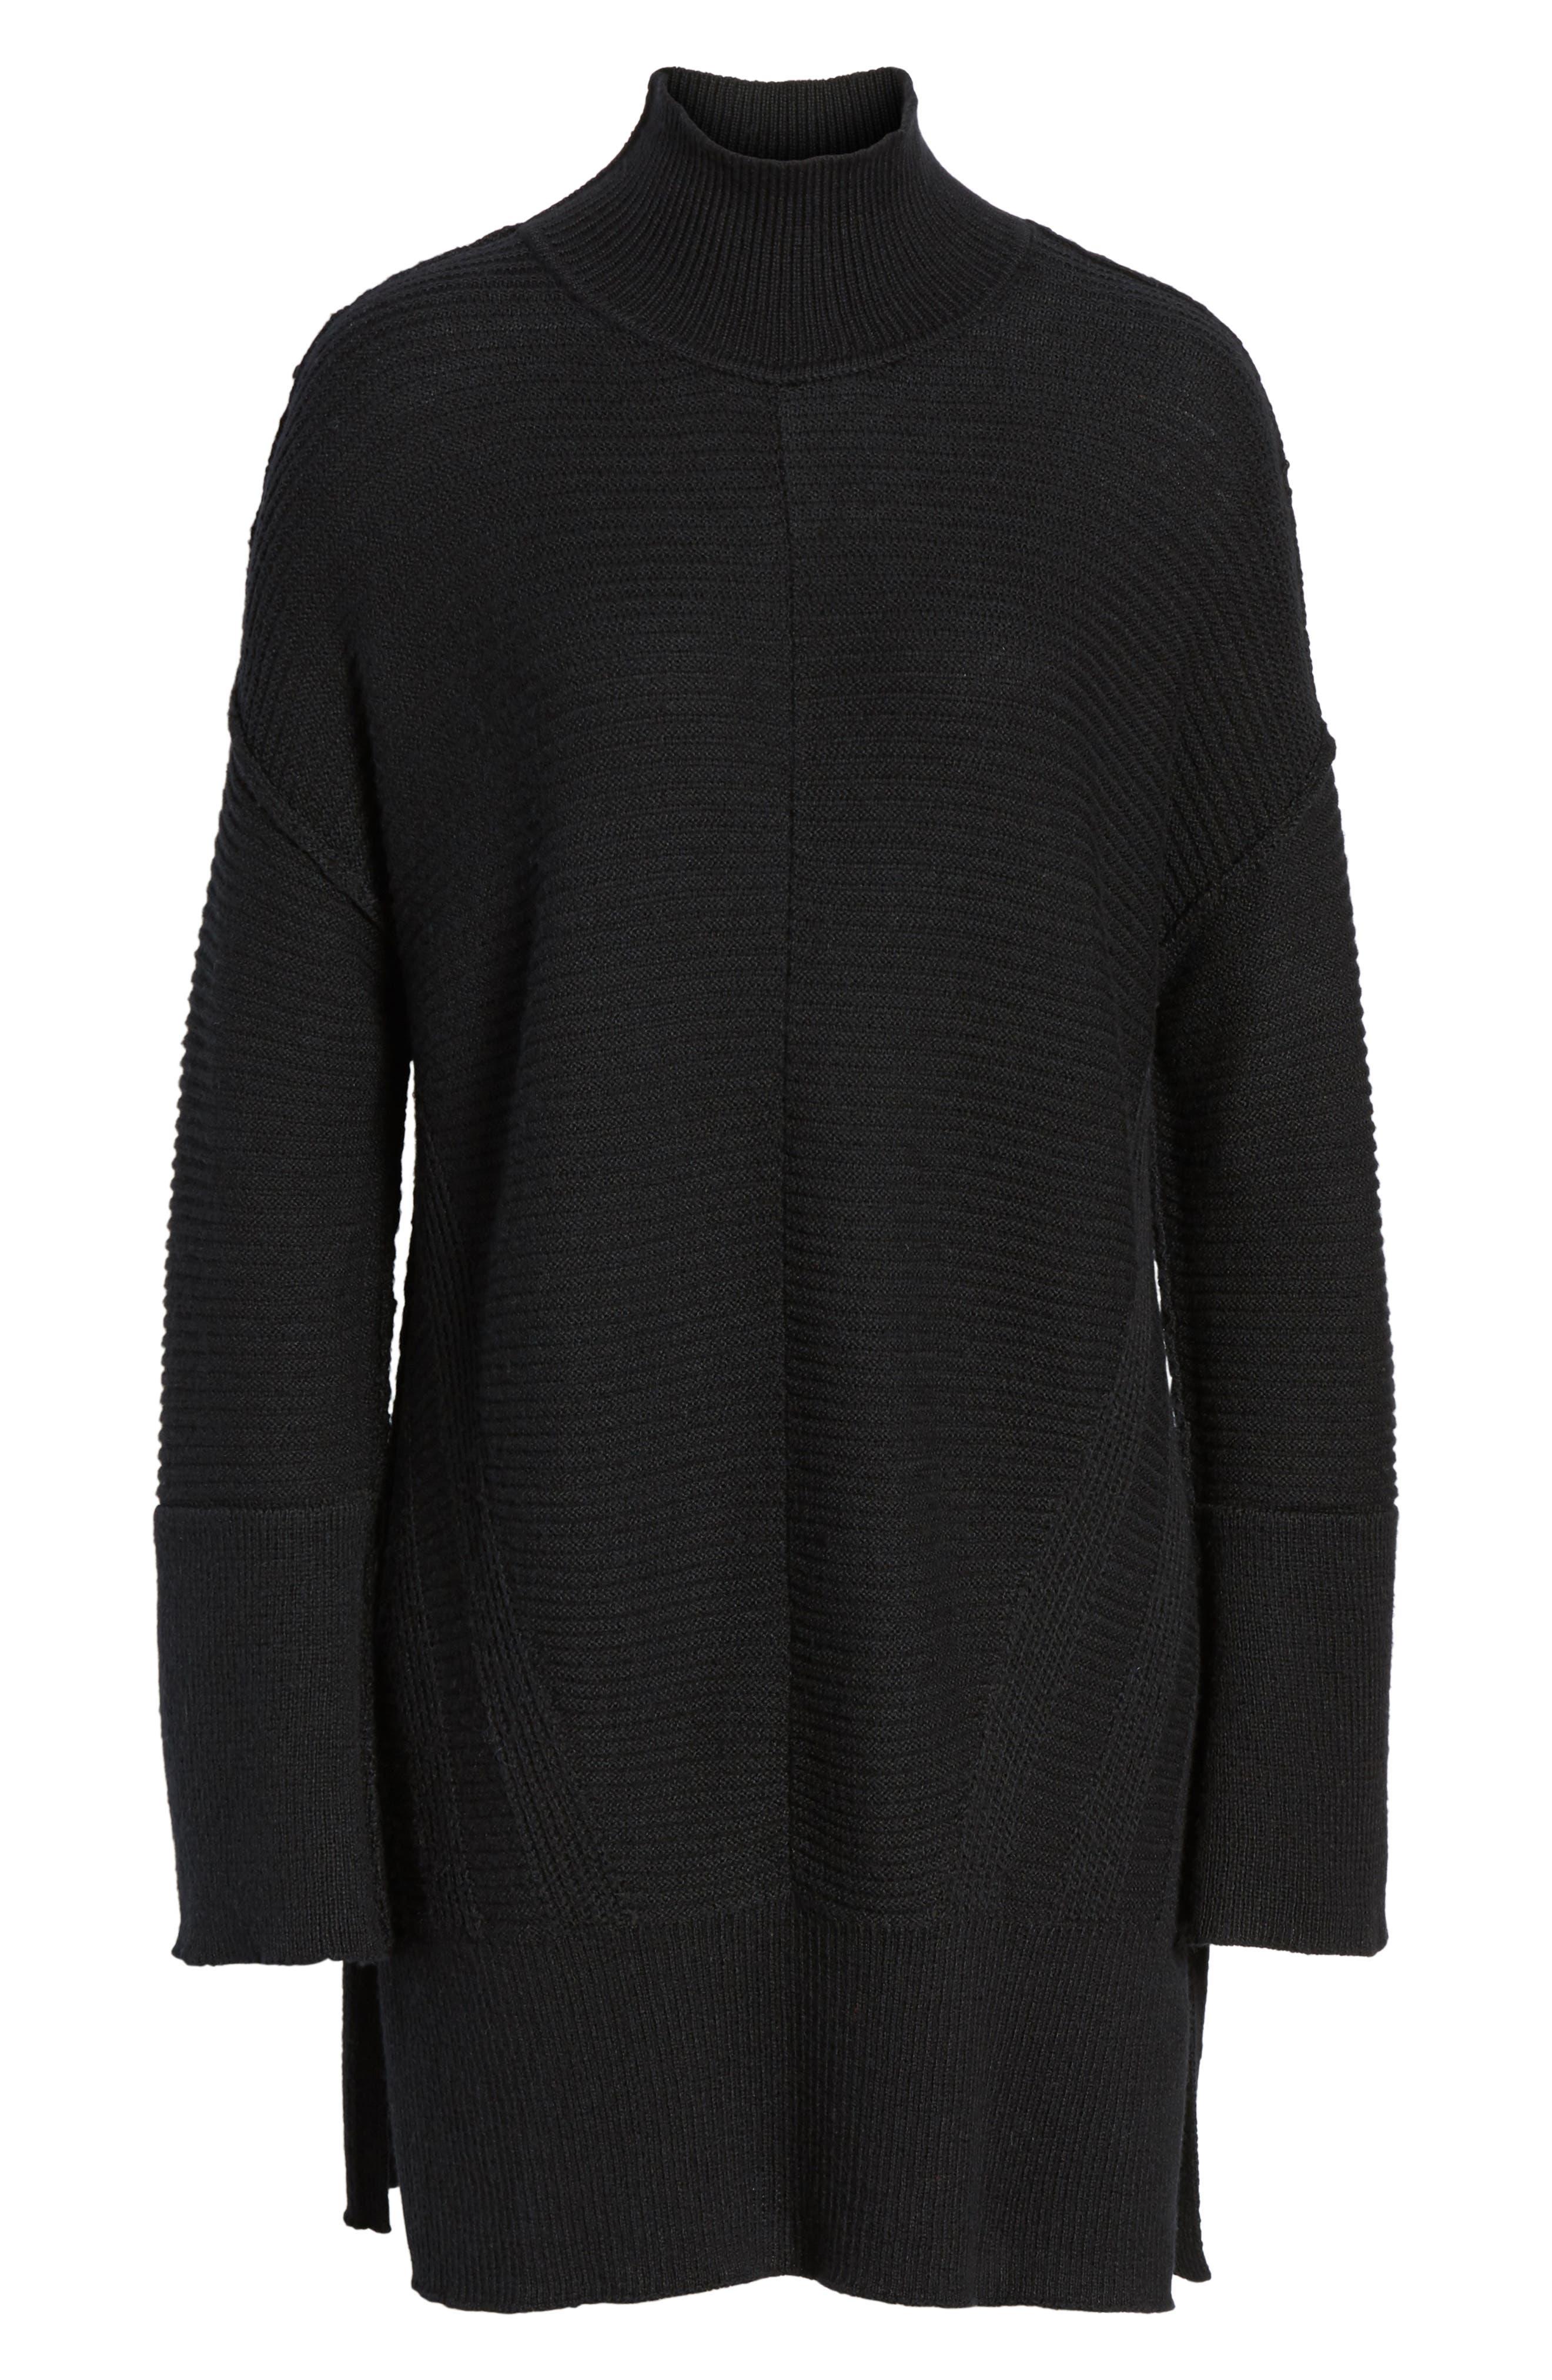 Ribbed Turtleneck Tunic Sweater,                             Alternate thumbnail 7, color,                             BLACK